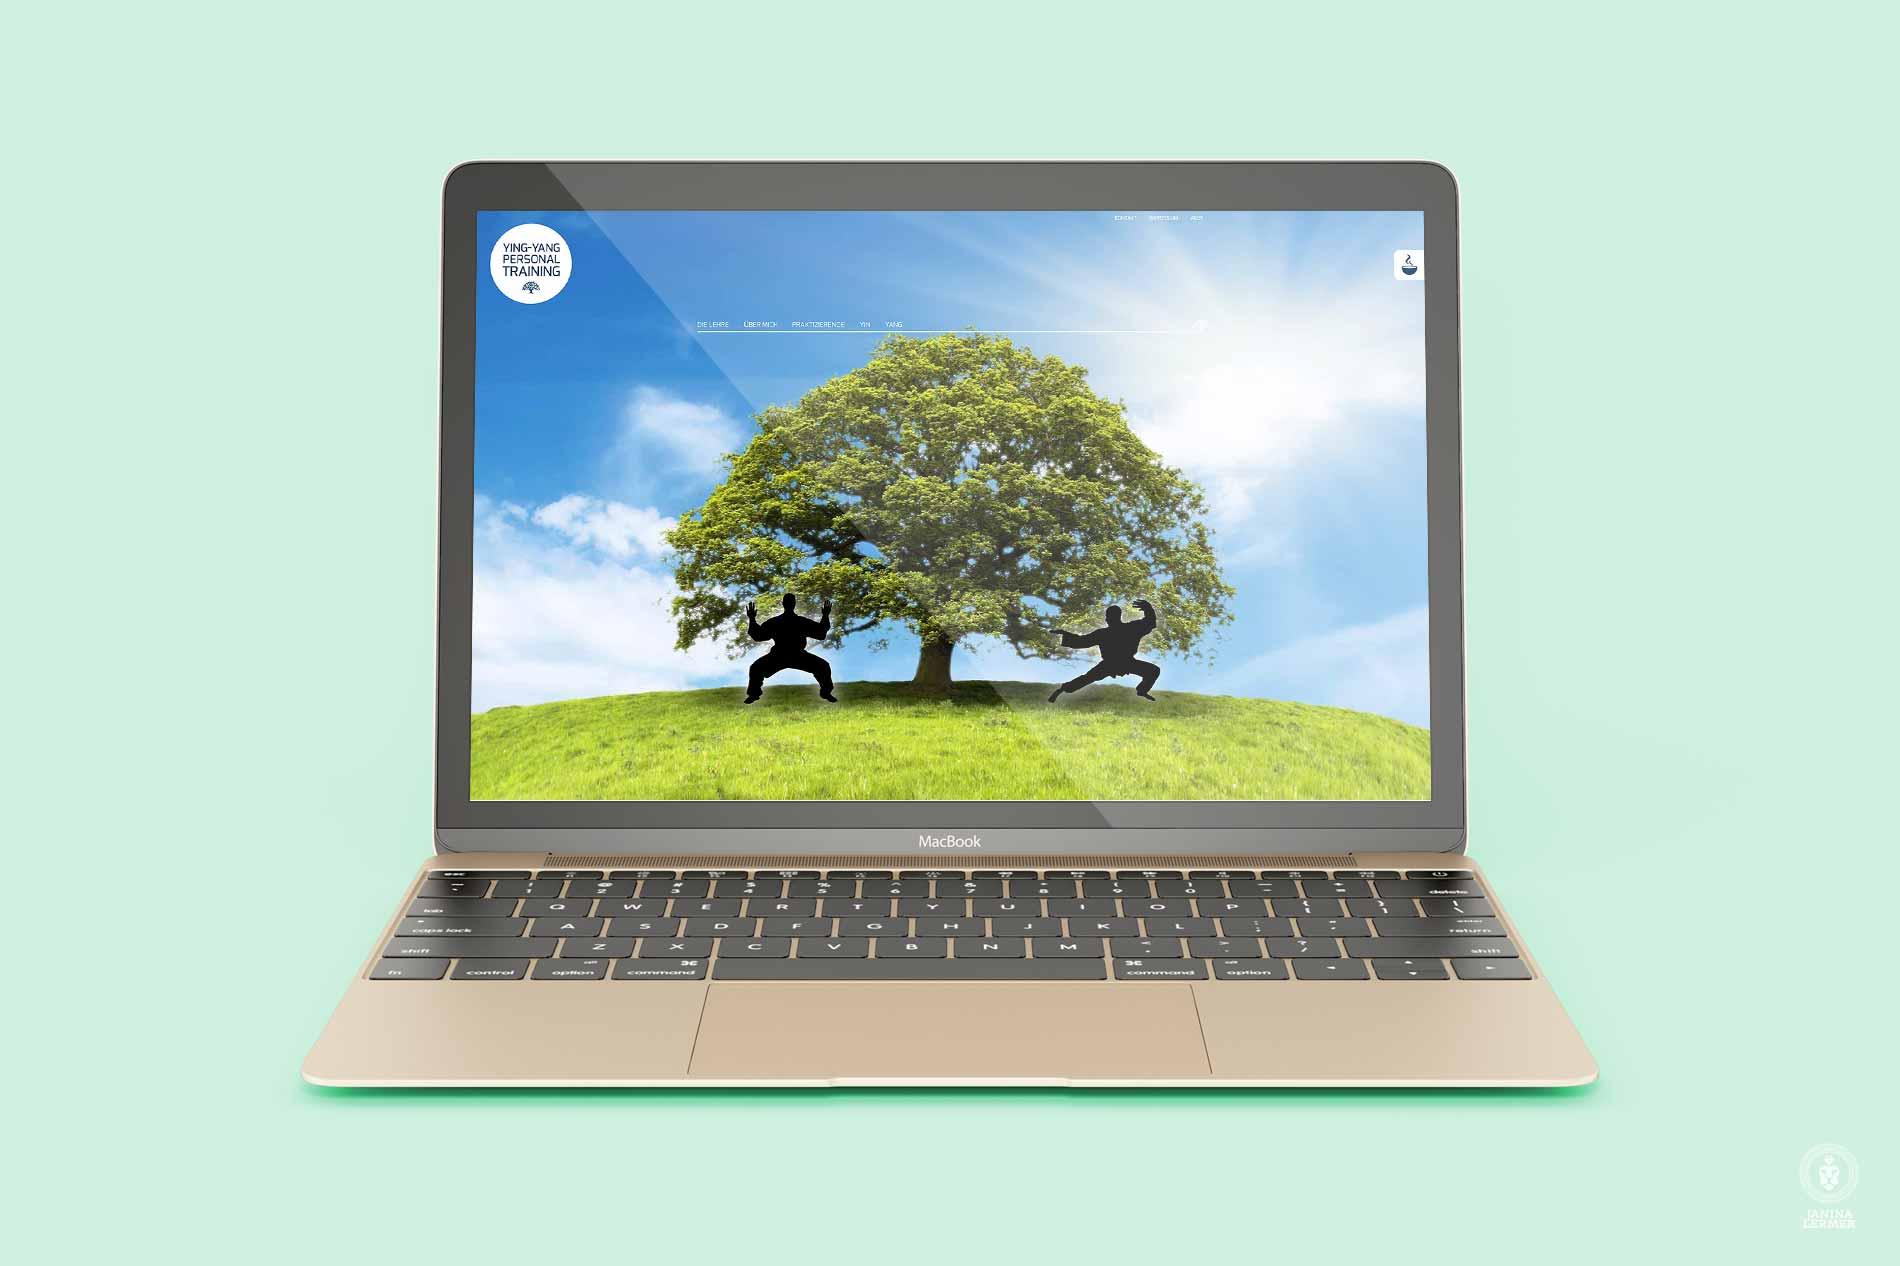 Webseitenkonzept-Webseitengestaltung-Webdesign-Yin-Yang-PersonalTrainer-Ulrich-Lampert-Laptop-Sommer-Summer